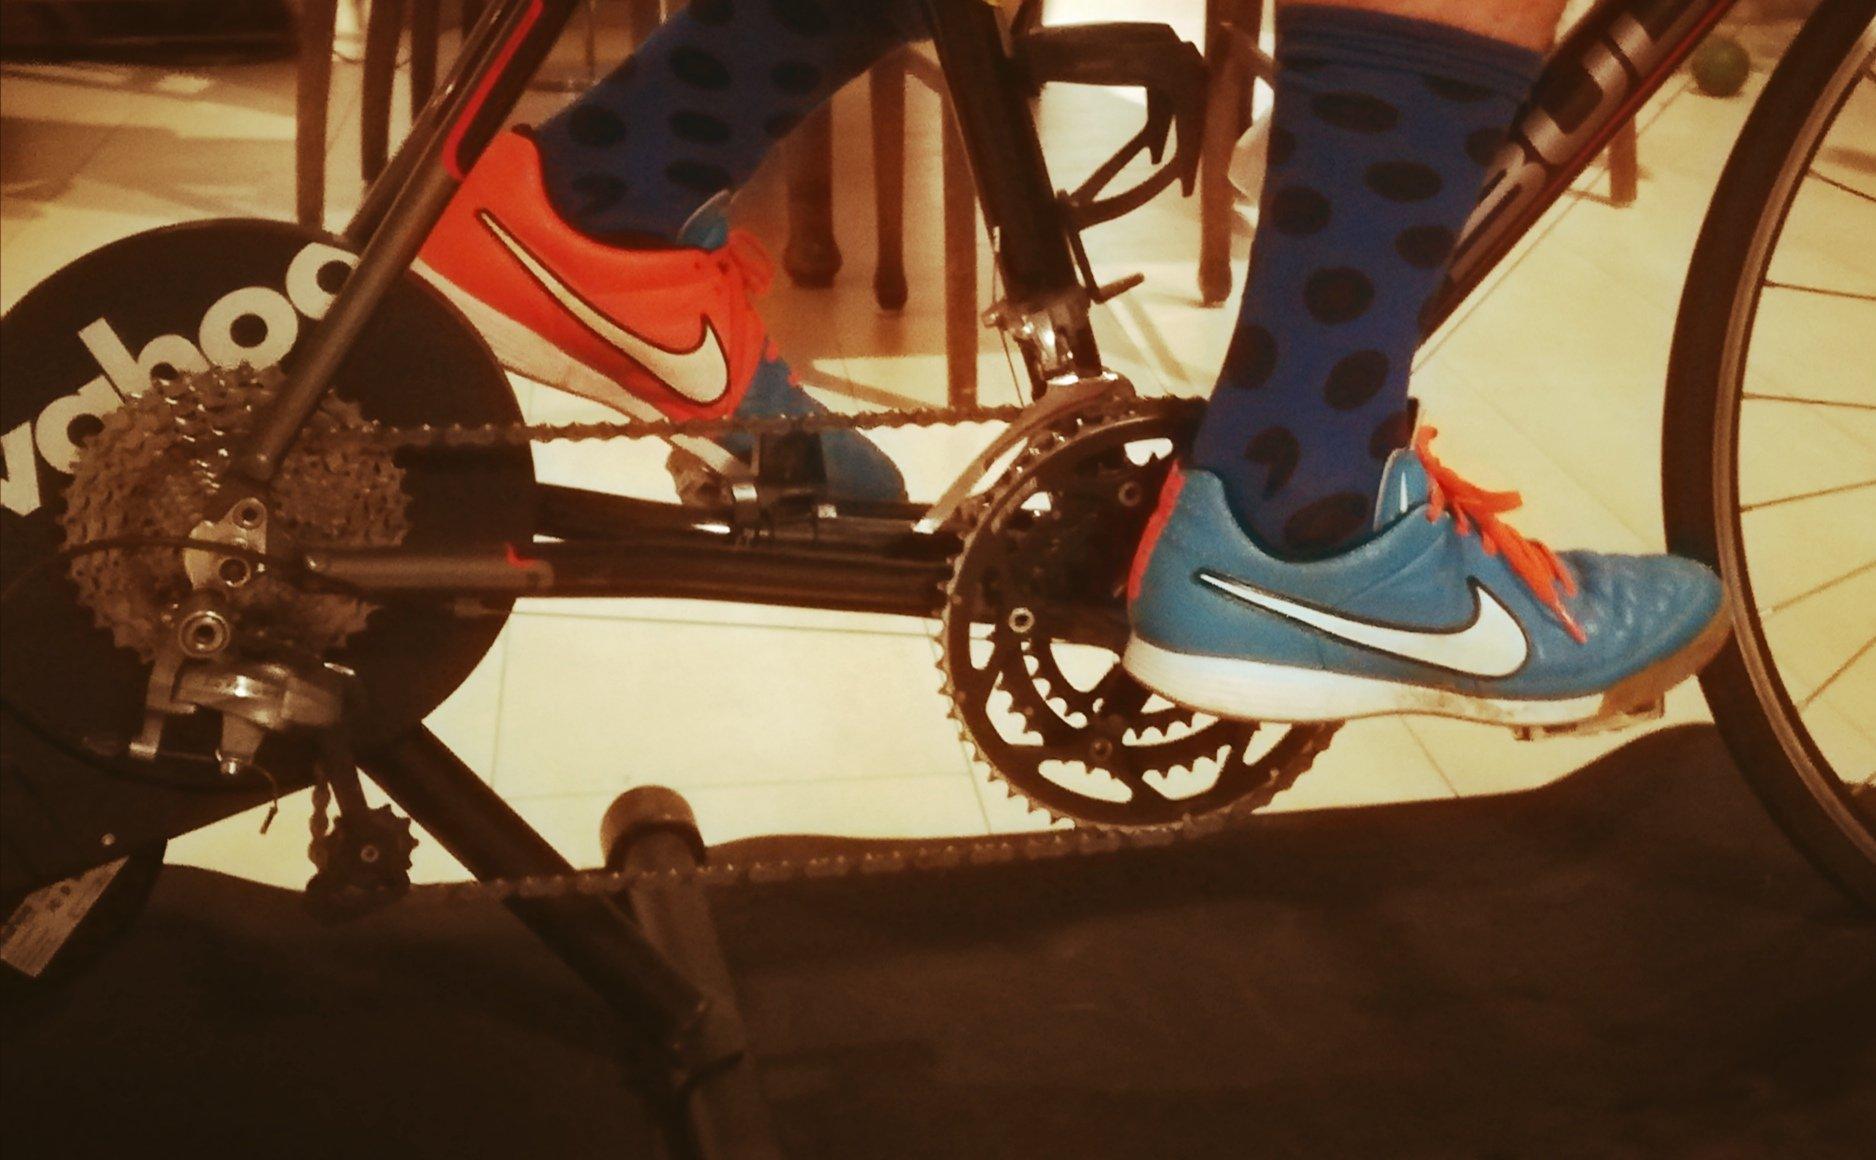 Radsport 2.0